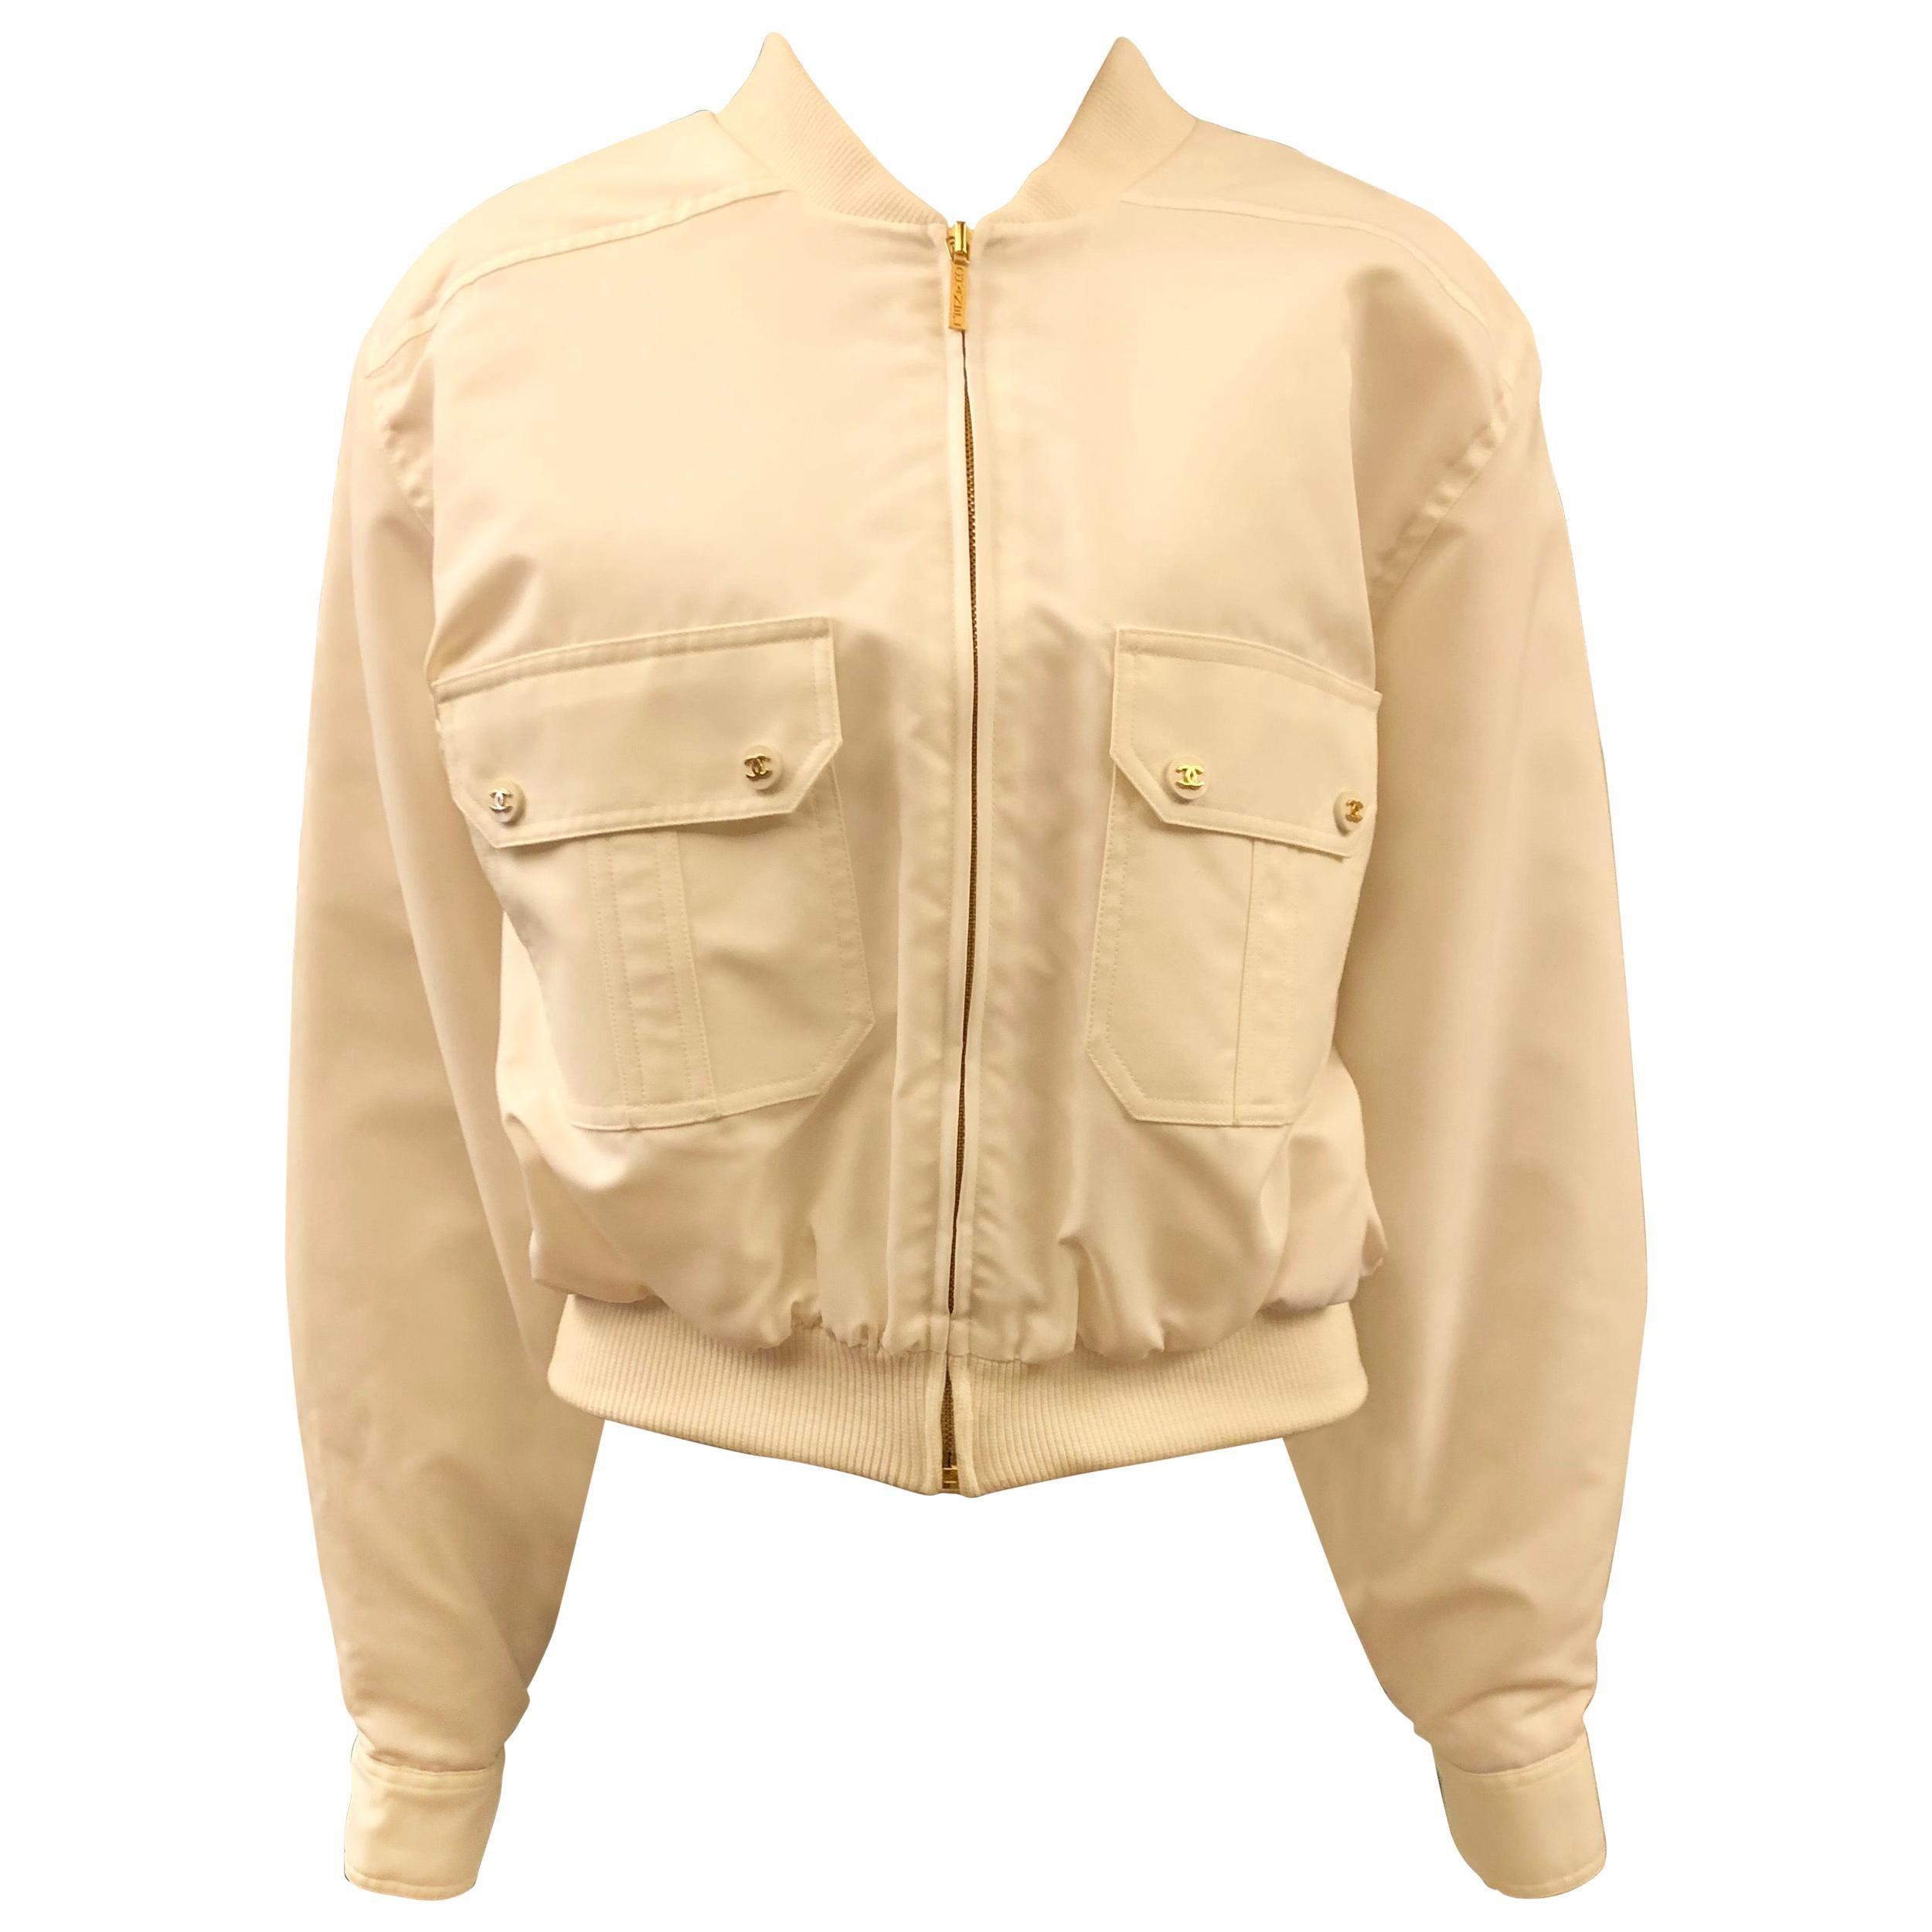 Vintage 1997 Chanel Off White Gathered Bomber Jacket